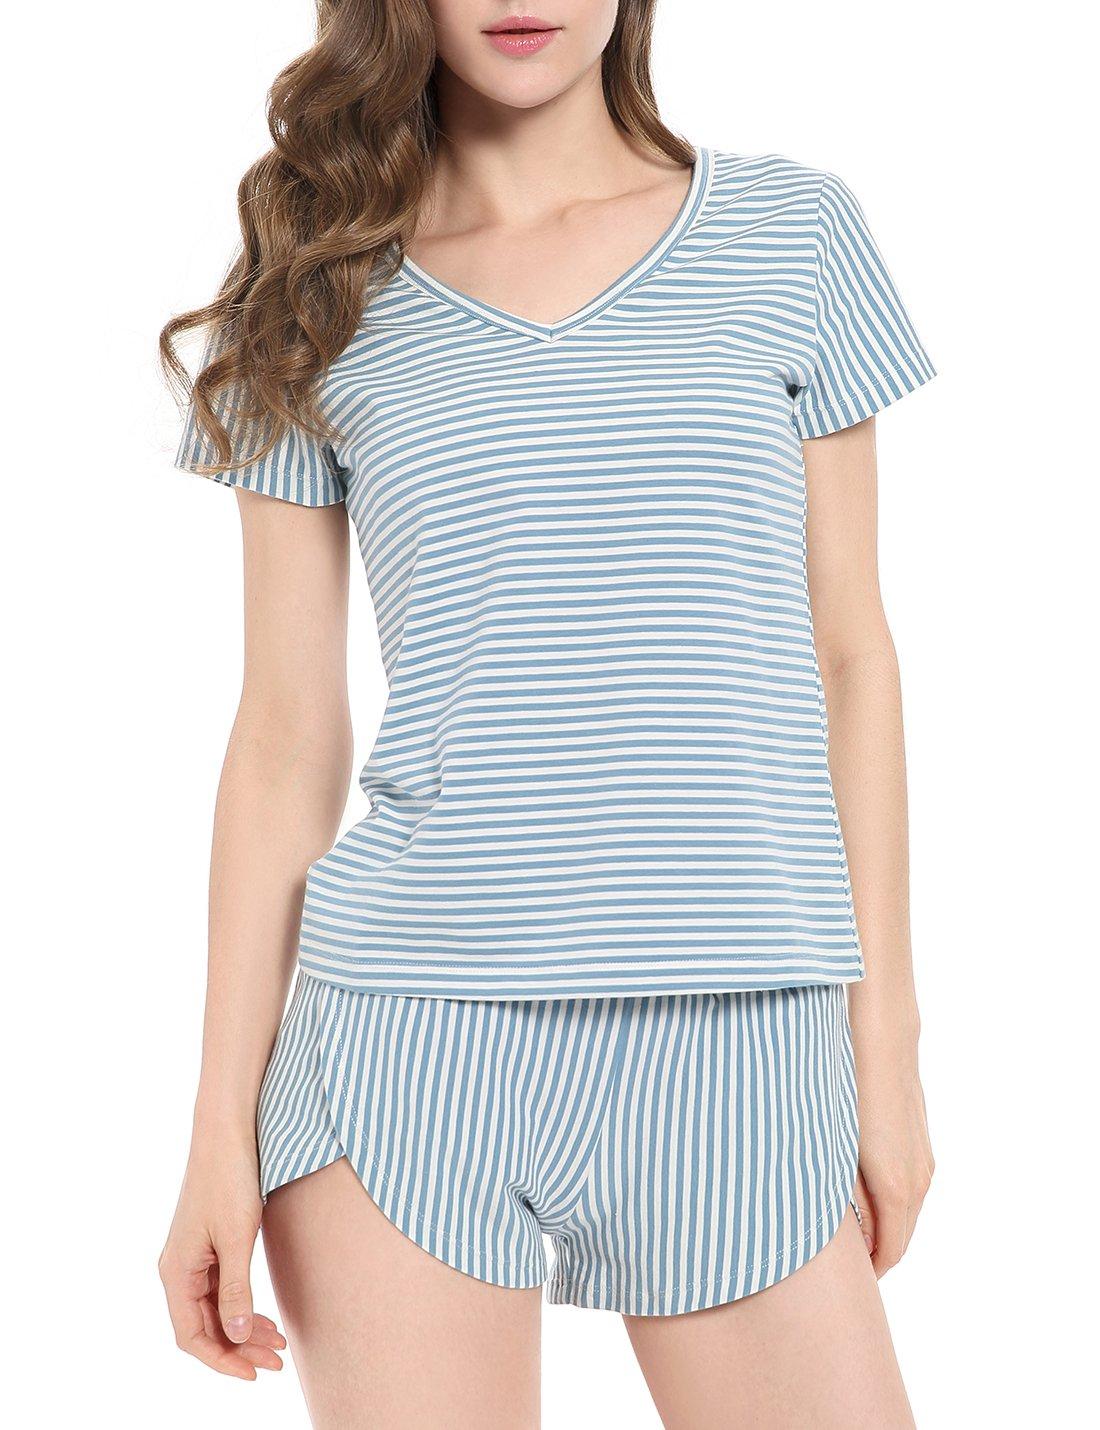 N NORA TWIPS Women's Pajamas Set V Neck Cotton Striped Short Sleeves Top Pants